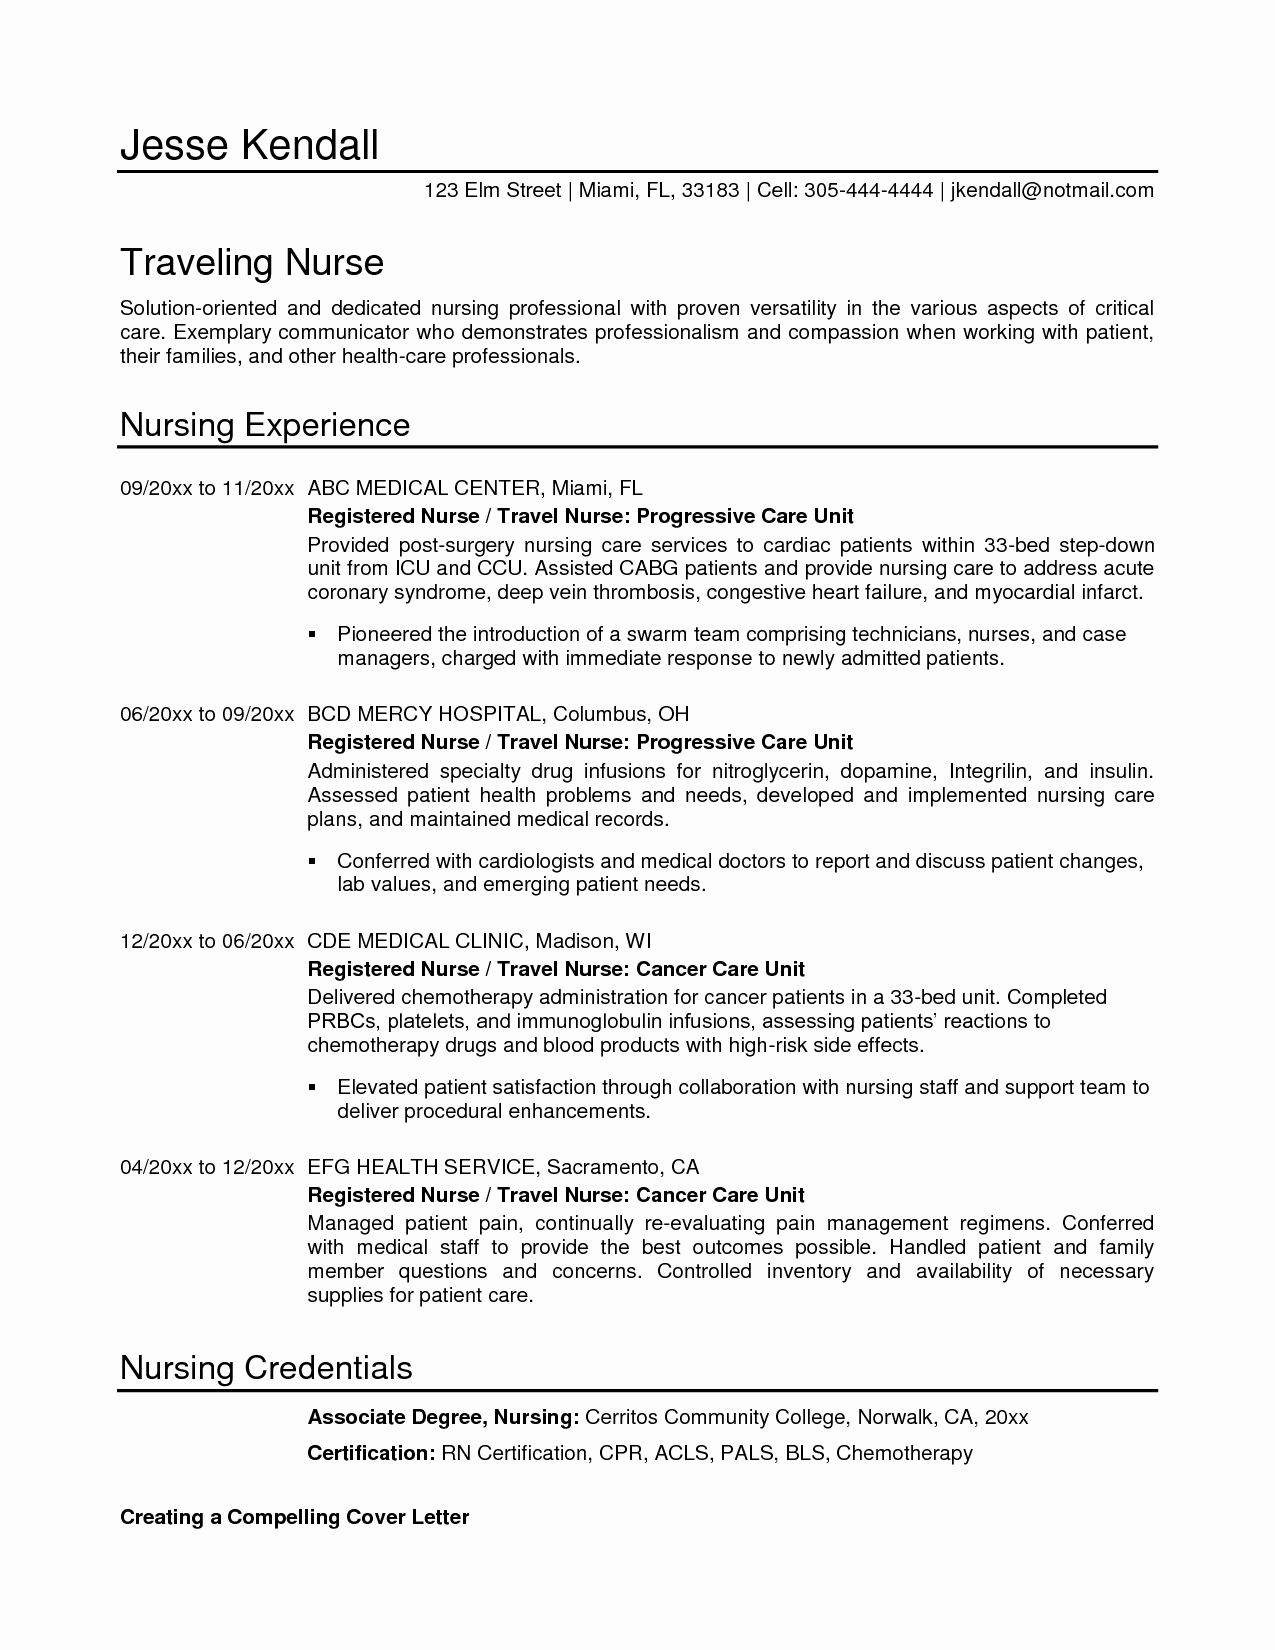 Sample Resume format for Nurses Nursing Student Resumes